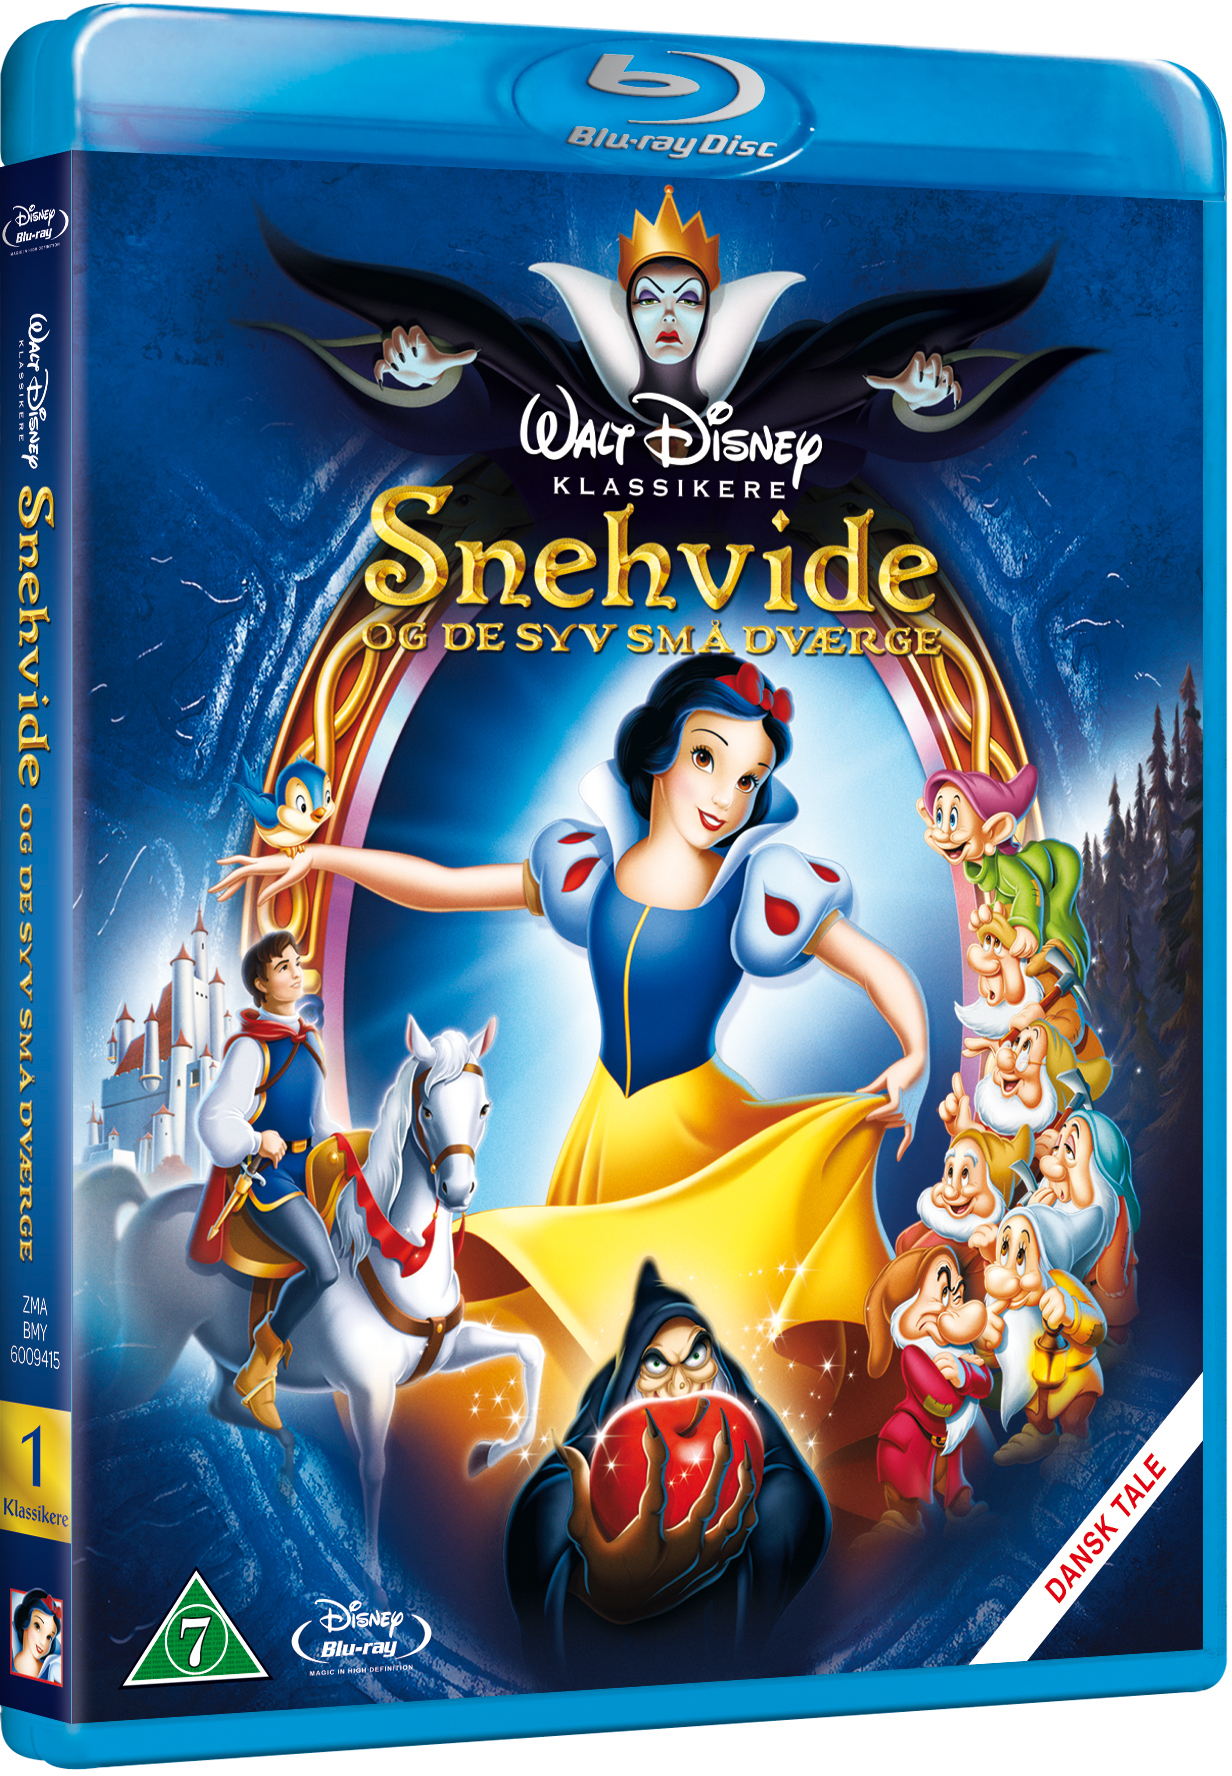 Snehvide og de syv små dværge Disney classic #1